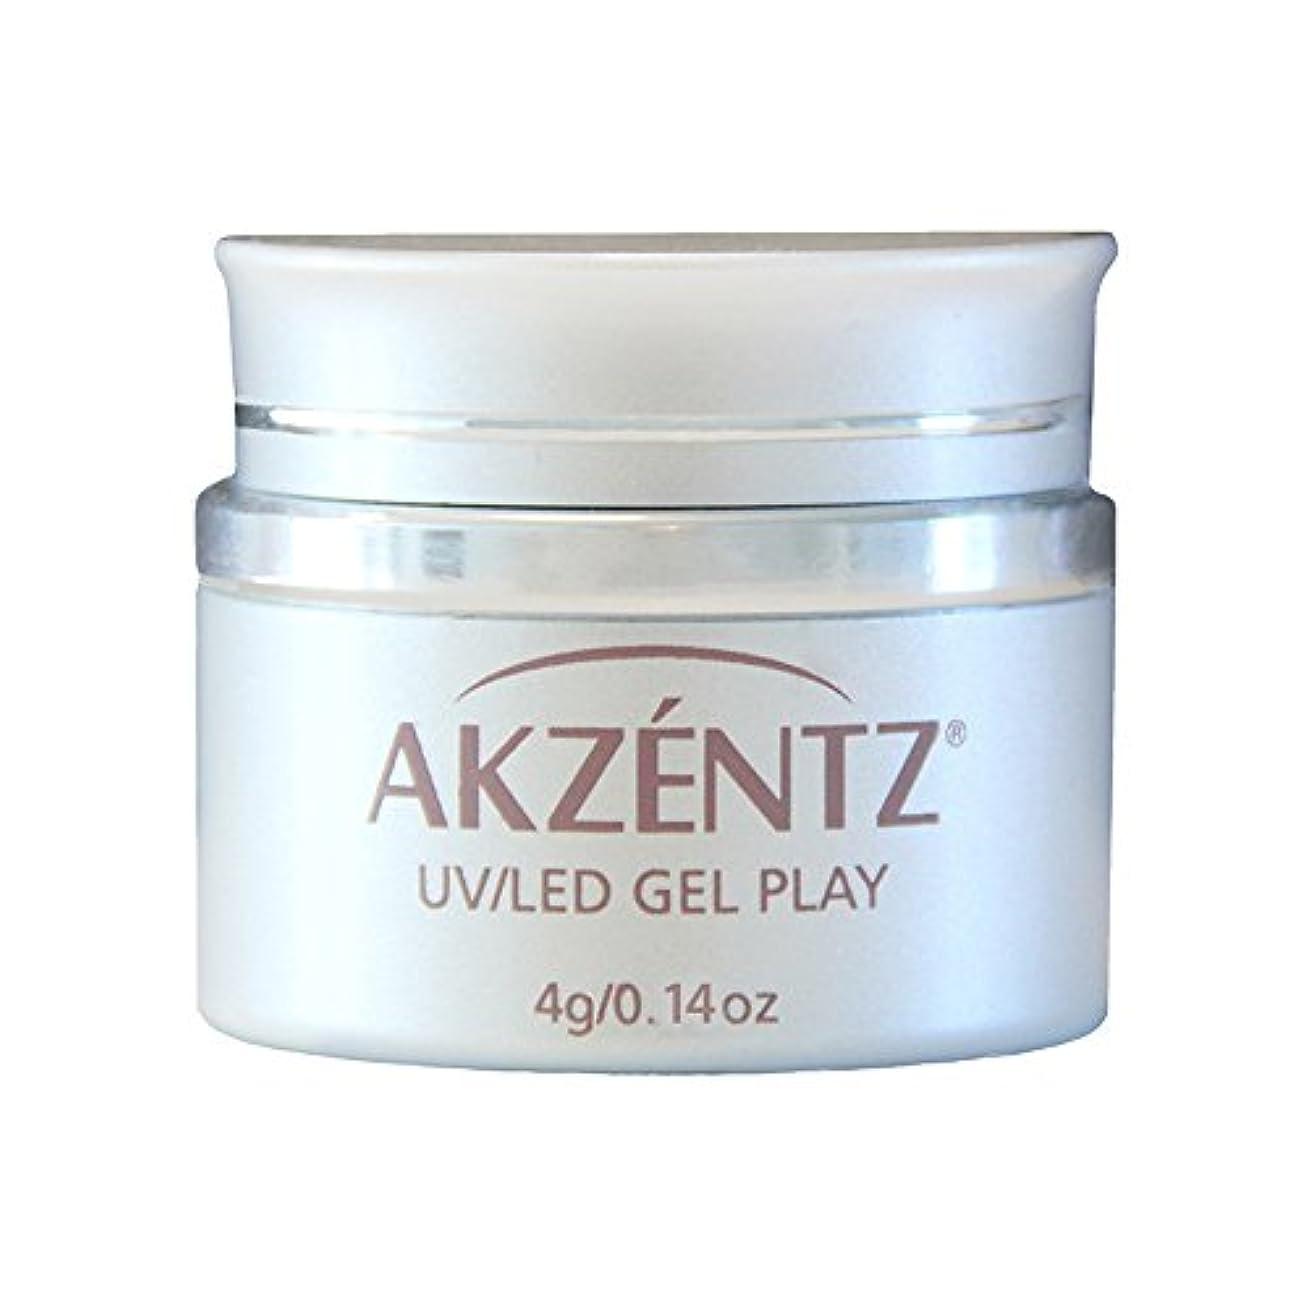 AKZENTZ カラージェル ジェルプレイ グリッター ピンクシャンパン 4g UV/LED対応